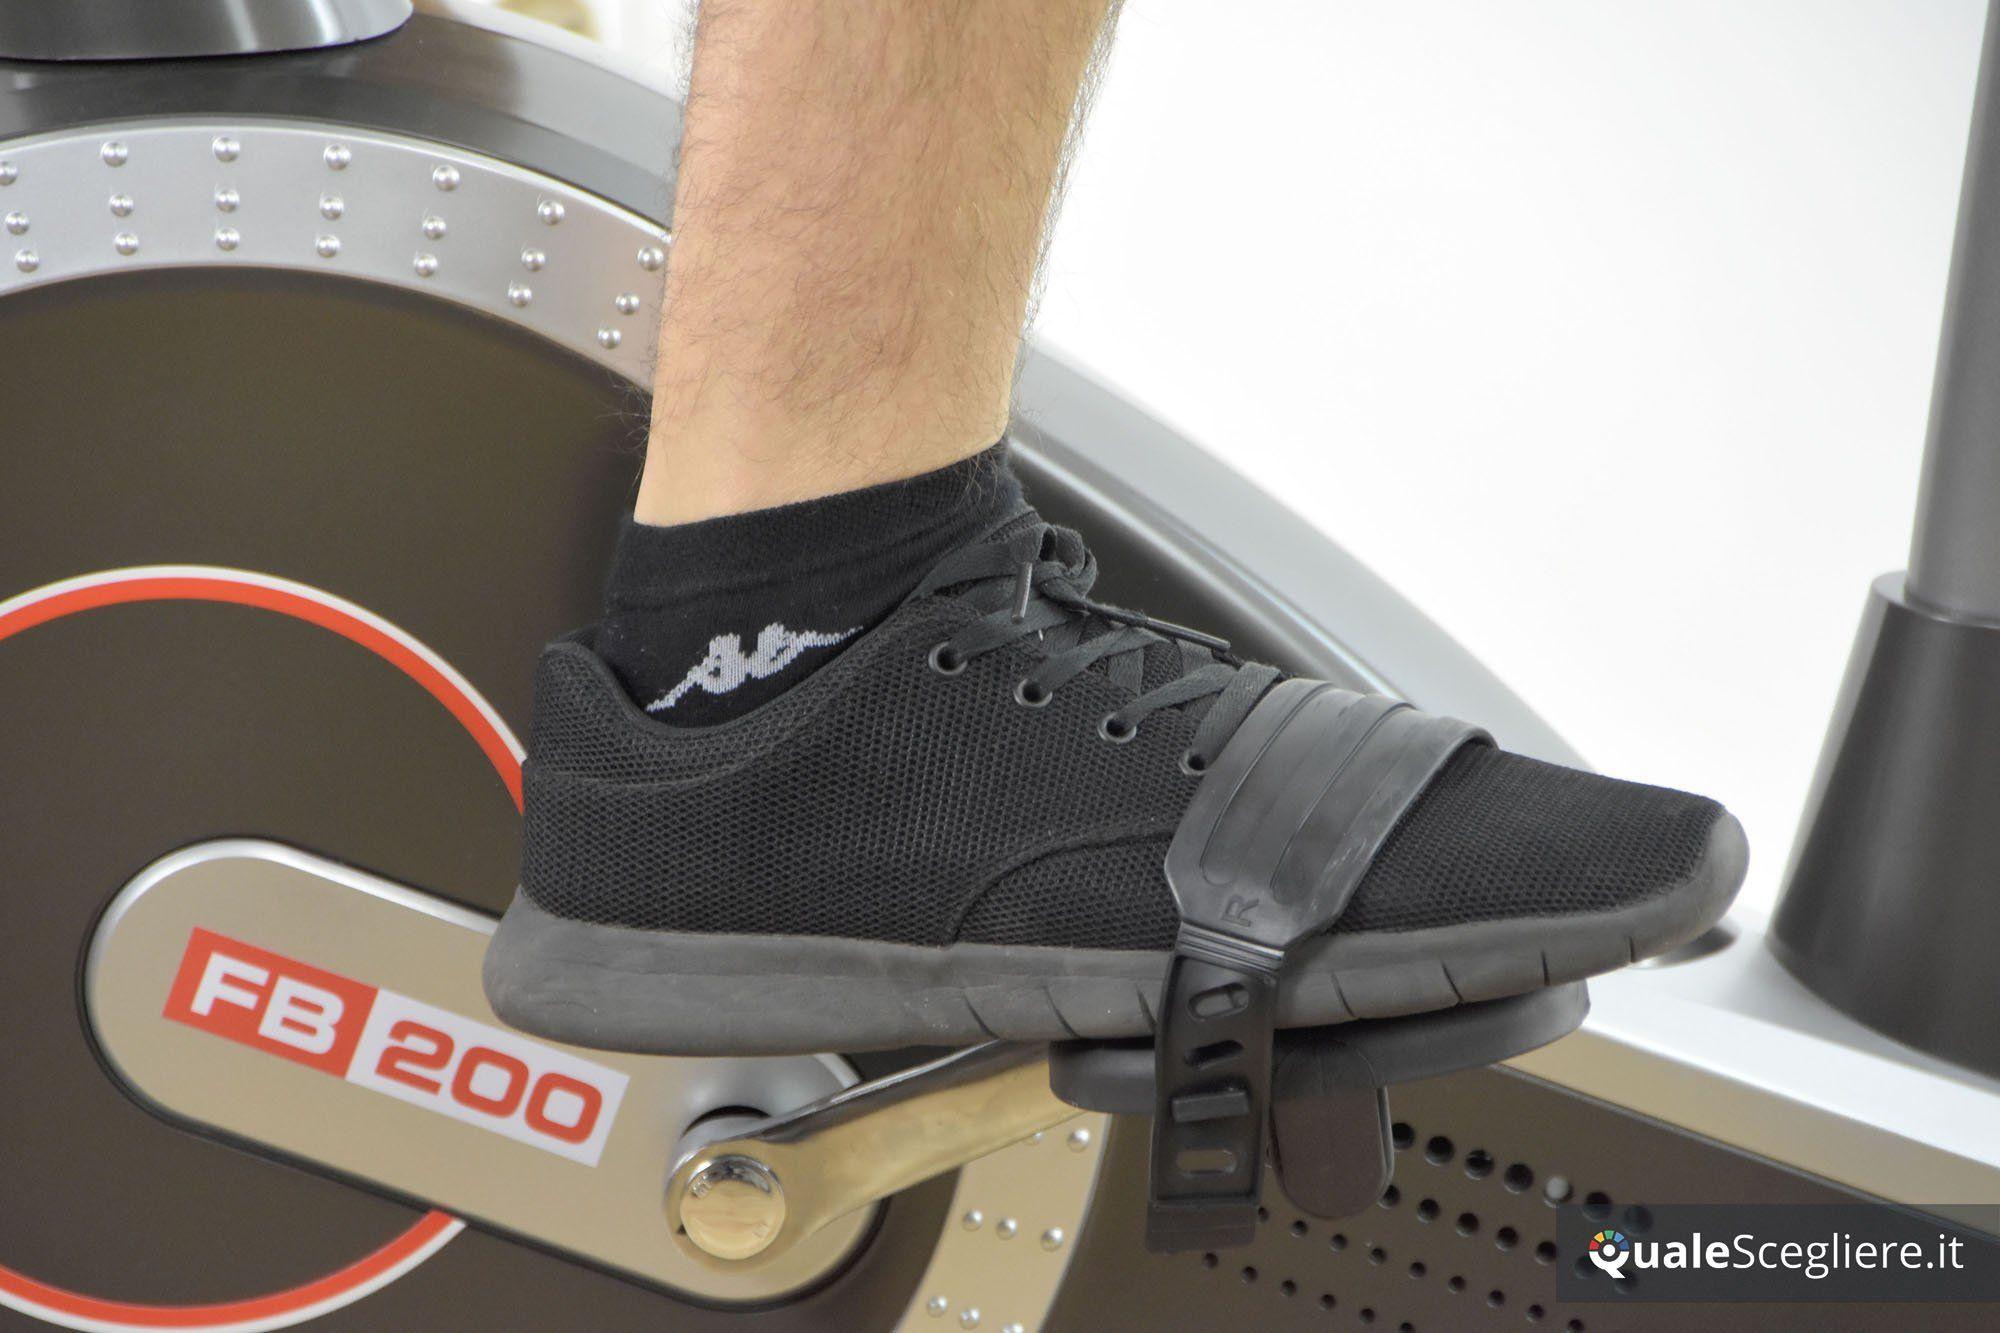 Fassi FB 200 pedale